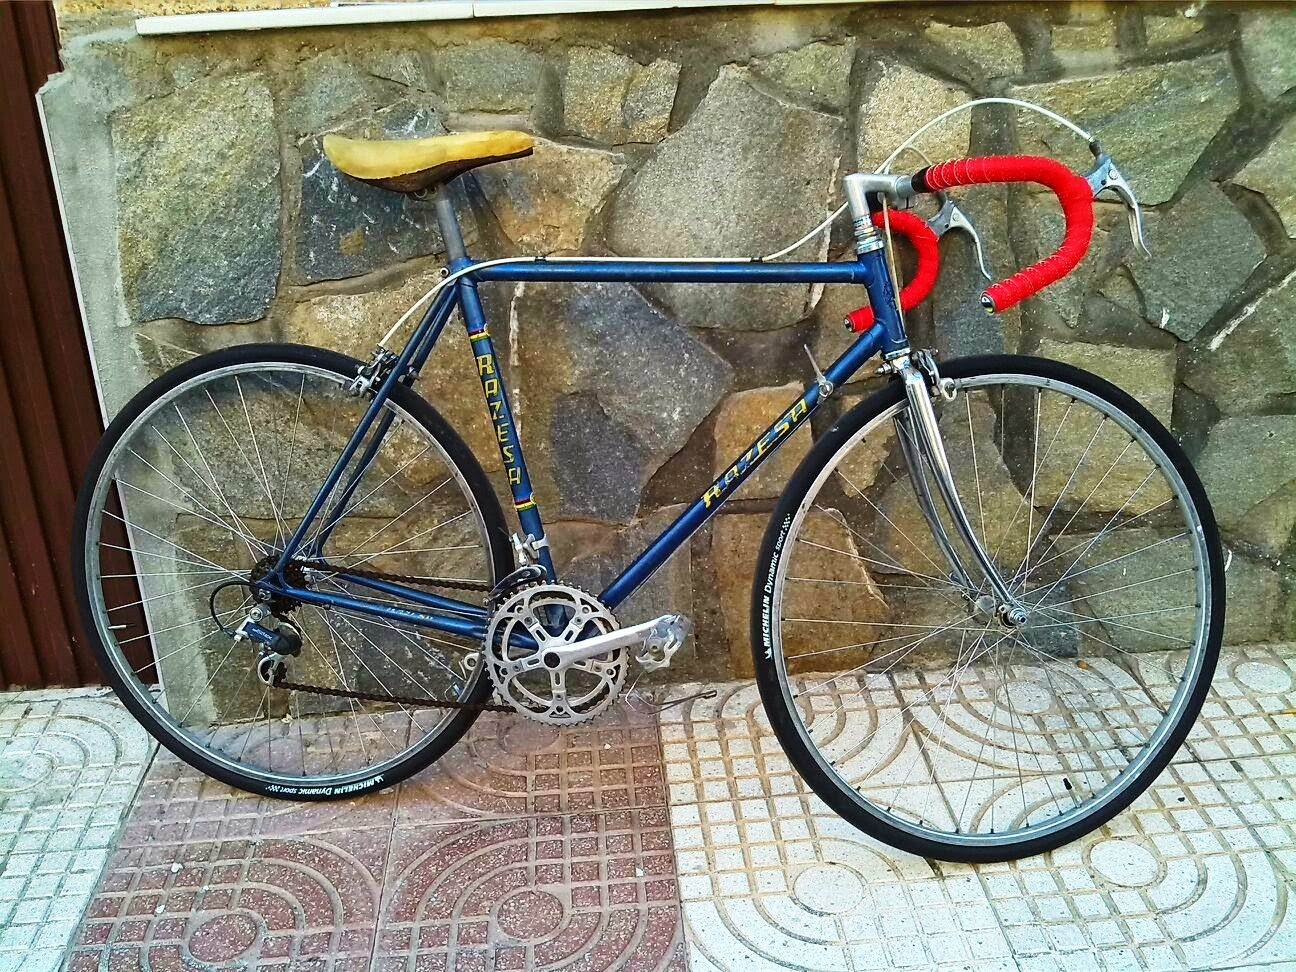 Aventurasenunabiciplegable: Mi nueva bicicleta, una clásica Razesa